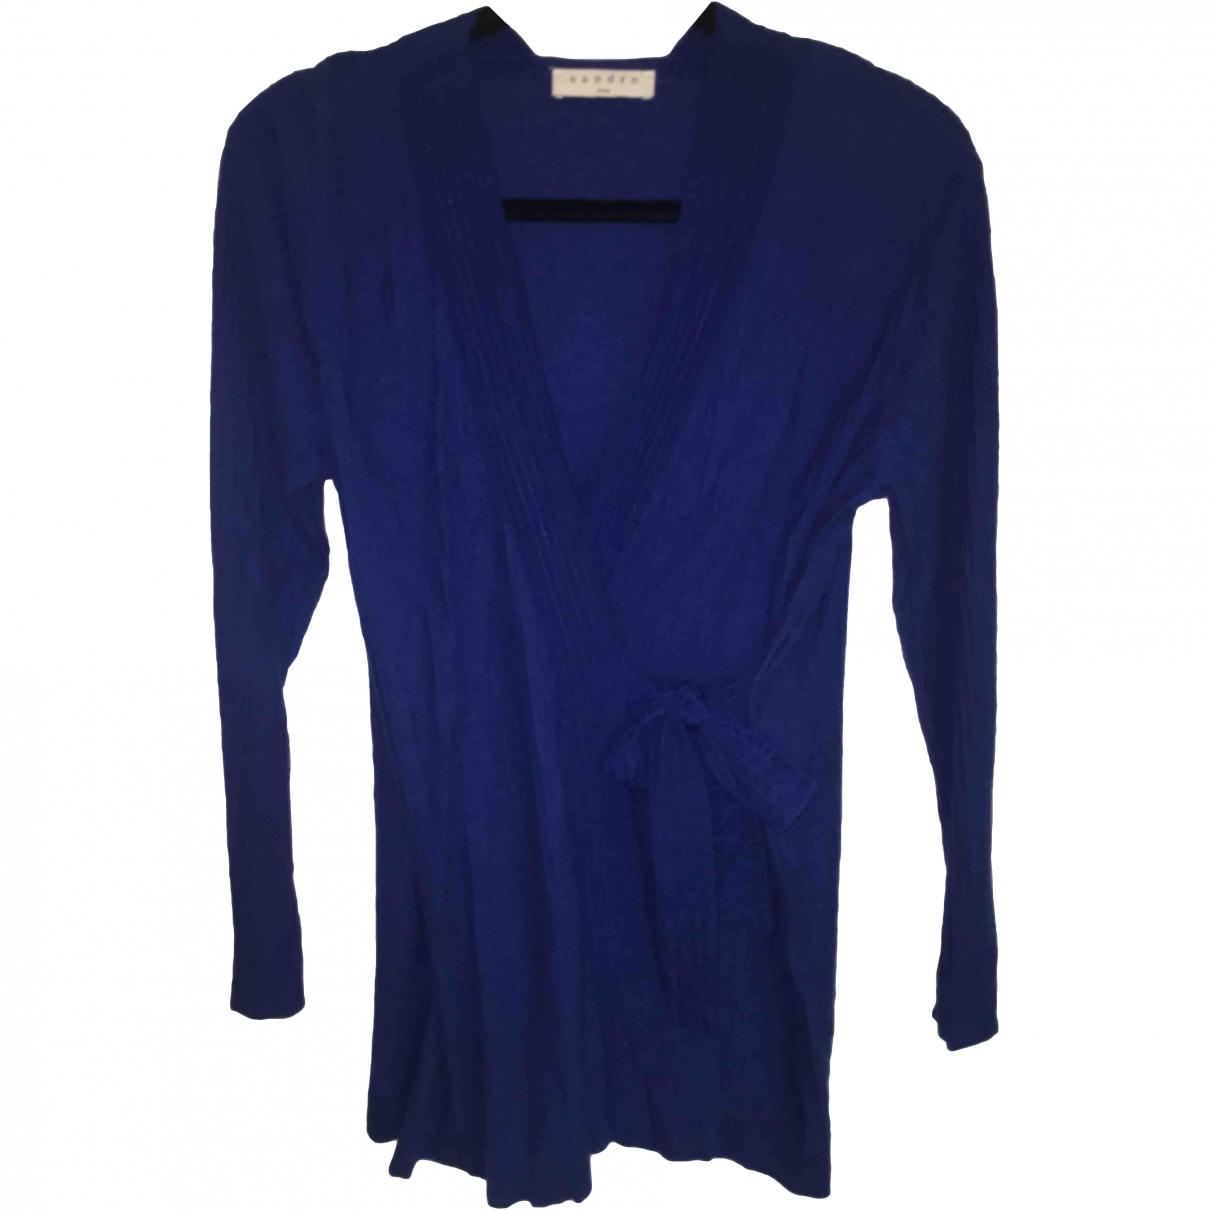 Sandro \N Navy Cotton Knitwear for Women 1 0-5